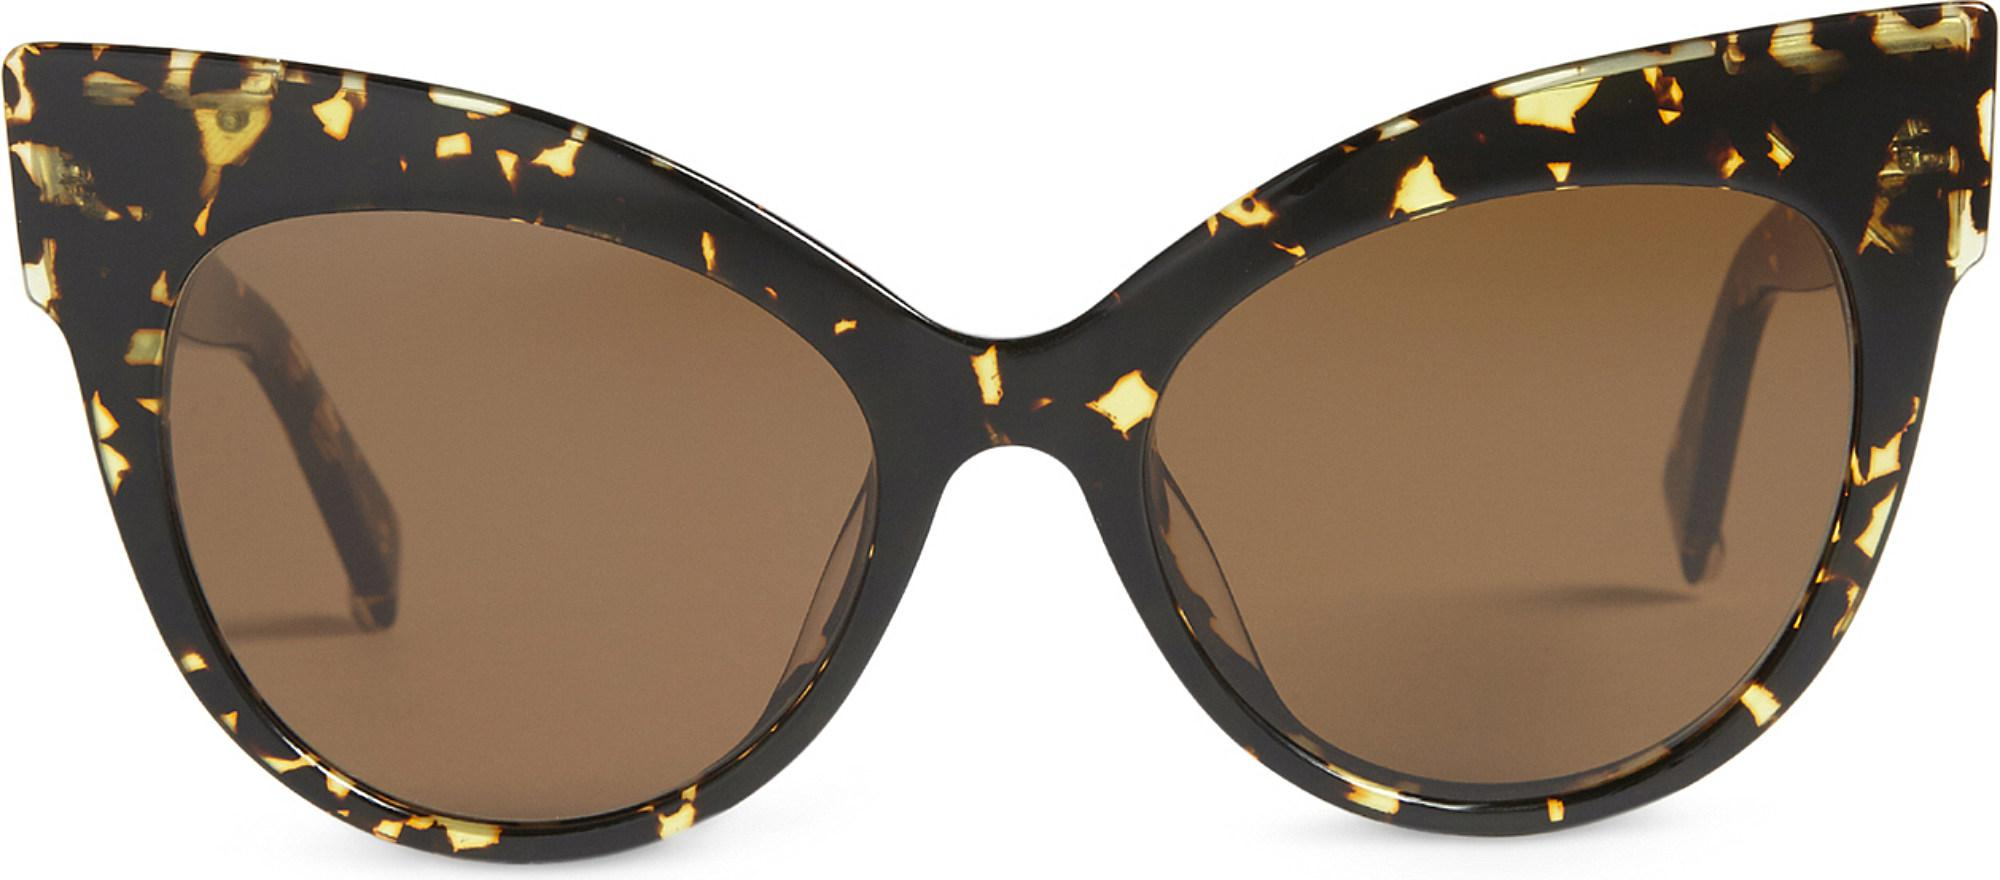 c77002a97b3d Max Mara Anita Cat-eye Sunglasses in Brown - Lyst